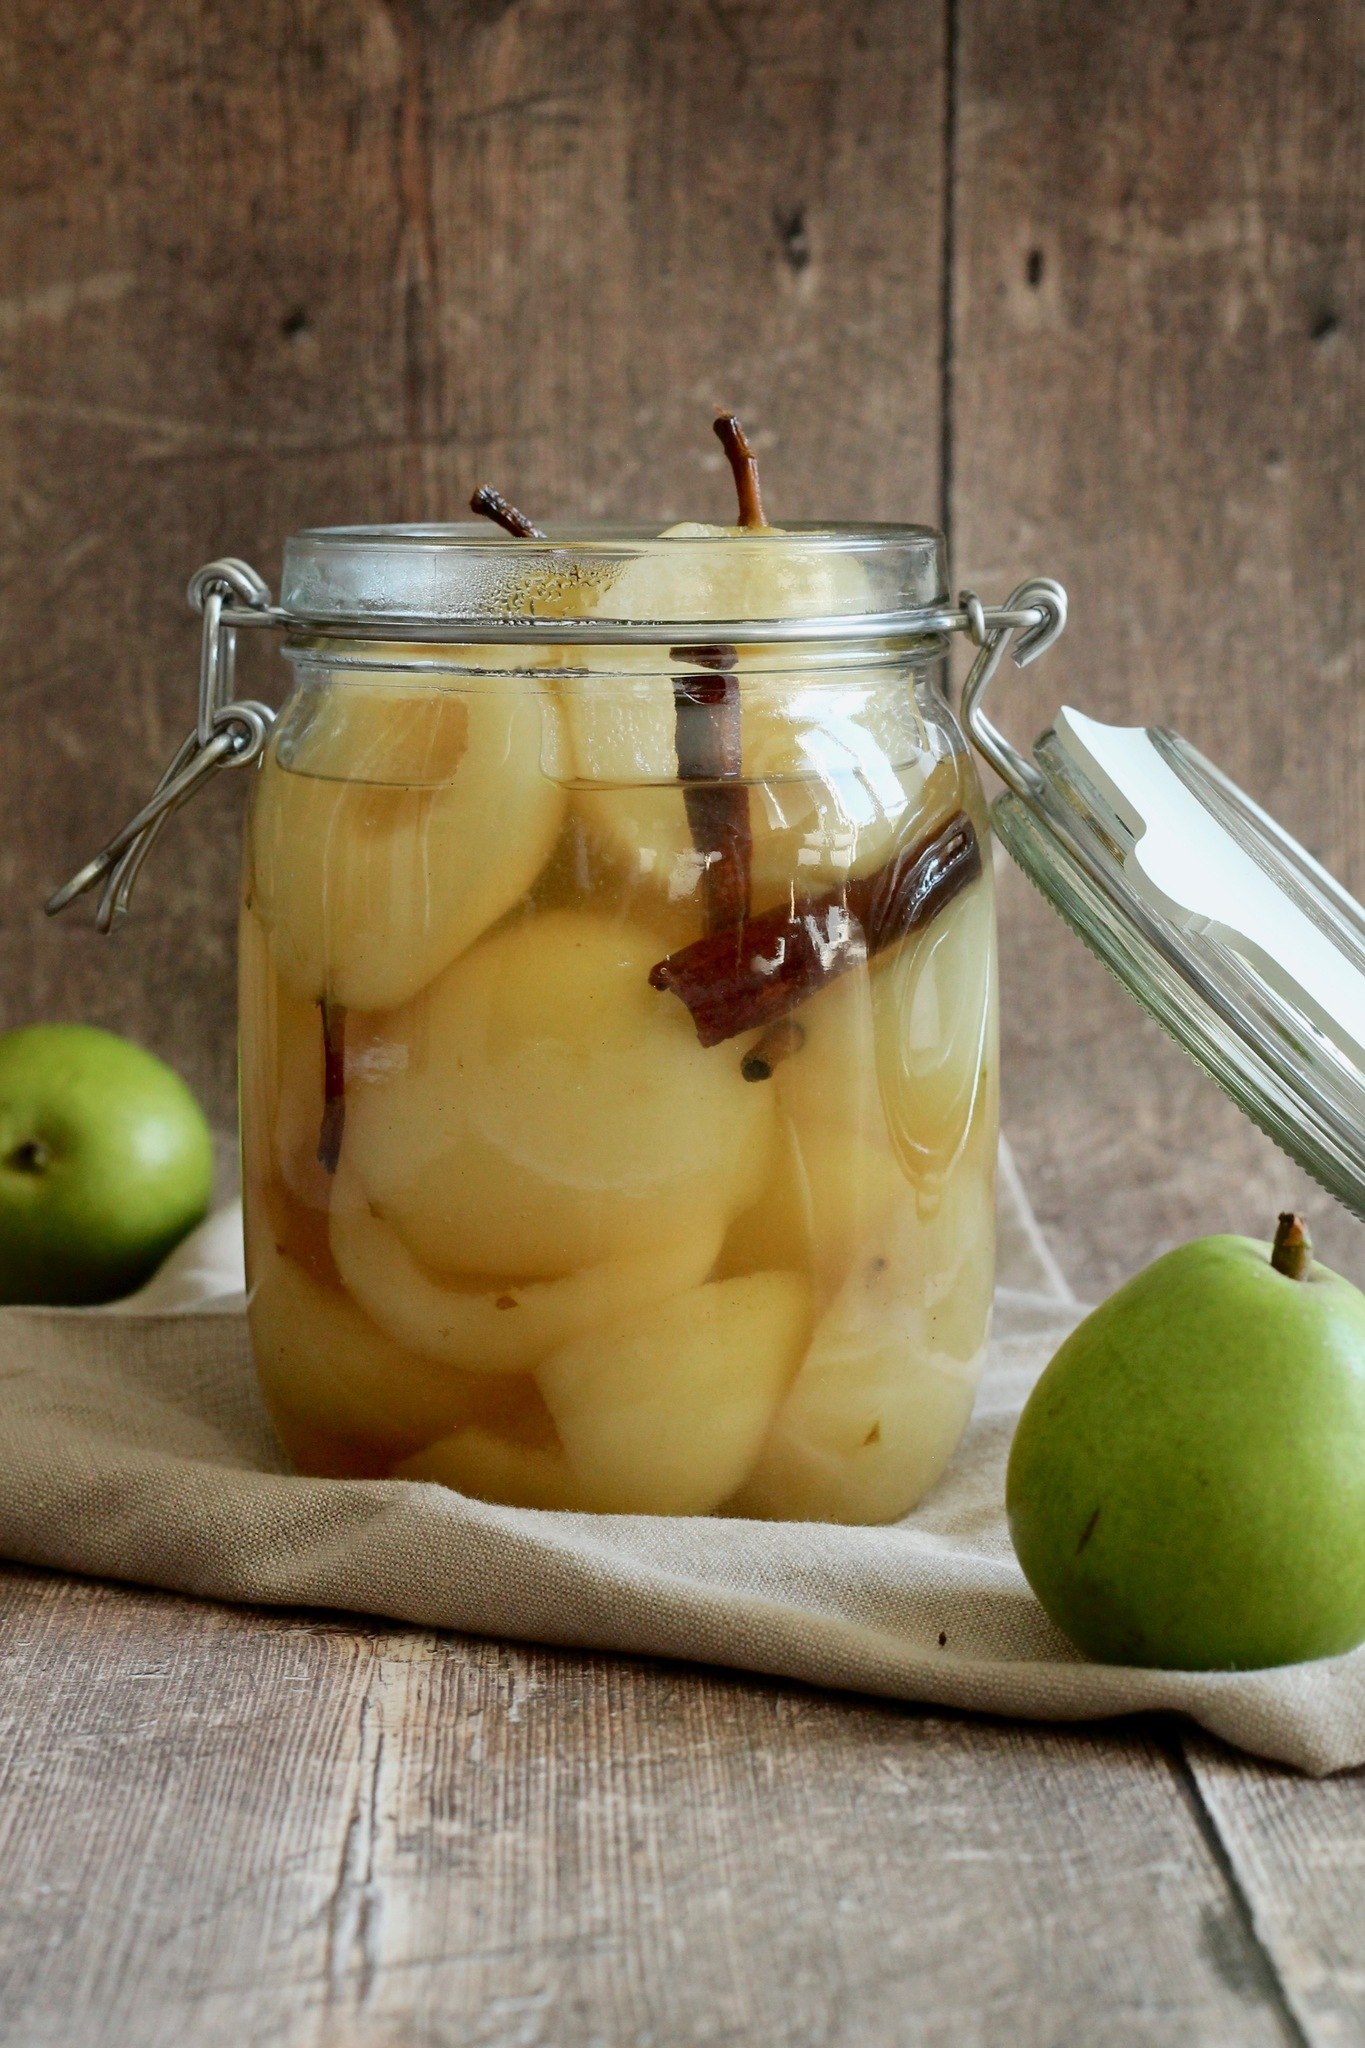 Syltede pærer - til pære belle helene eller som tilbehør til ost, grød eller andre desserter.